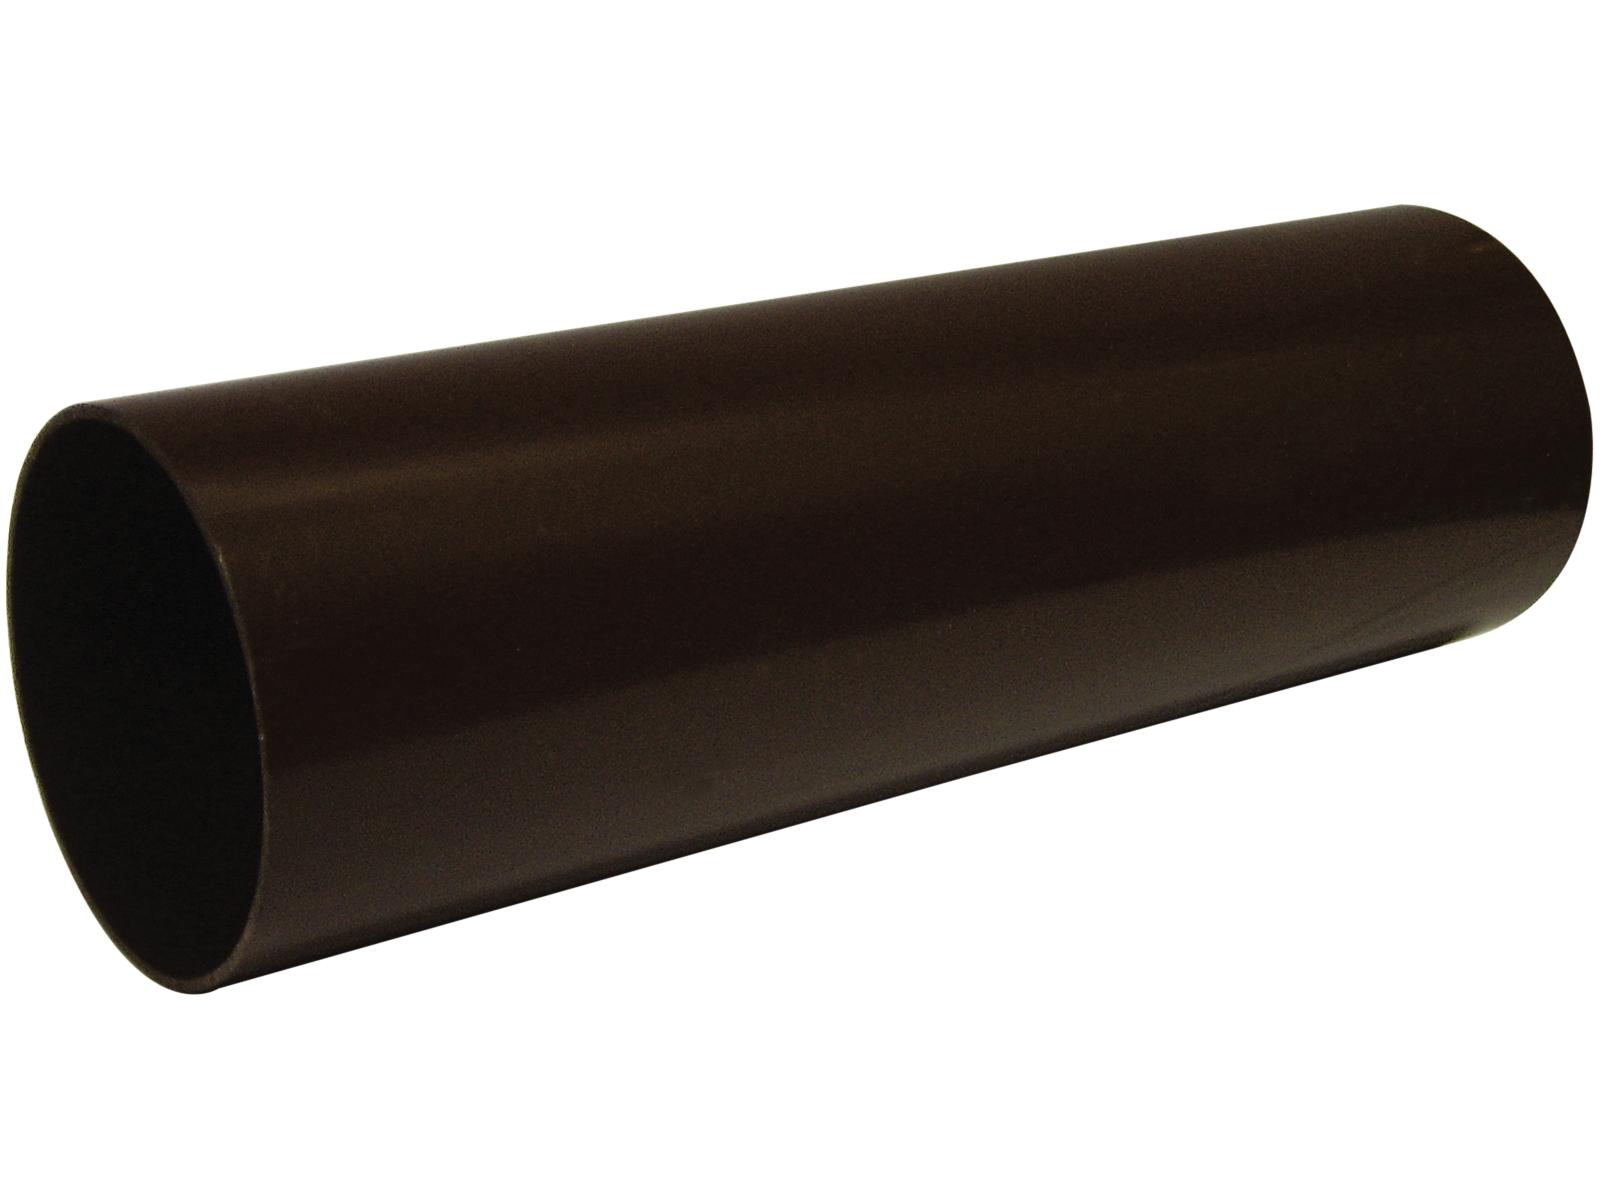 Floplast RP5.5BR 68mm Round Downpipe 5.5 Metre - Brown